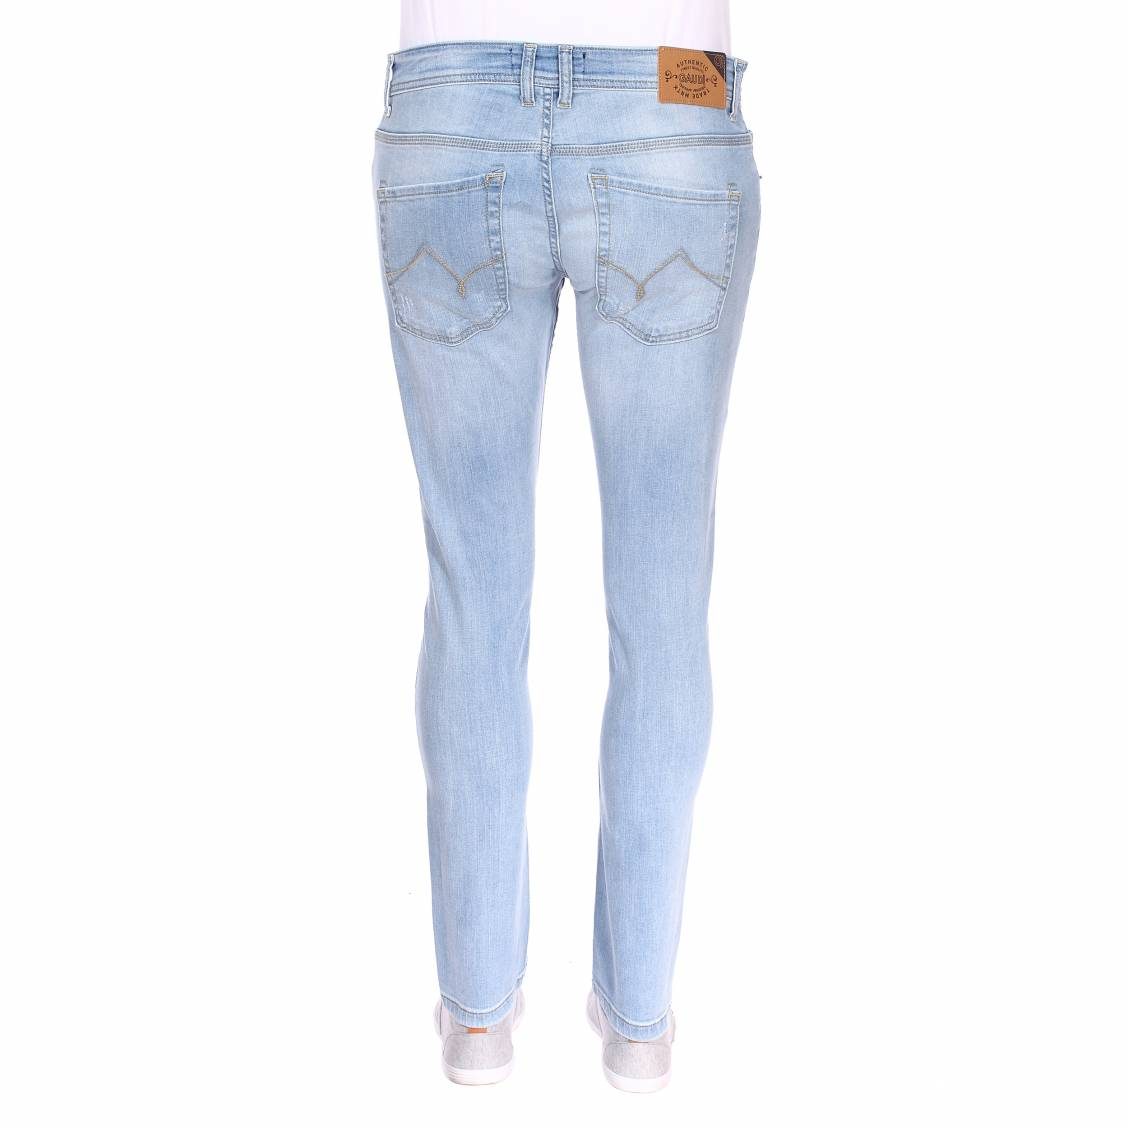 Jean Gaudi Stretch Coton Skinny Bruce Bleu Des ClairRue Hommes En q4ScR5jL3A